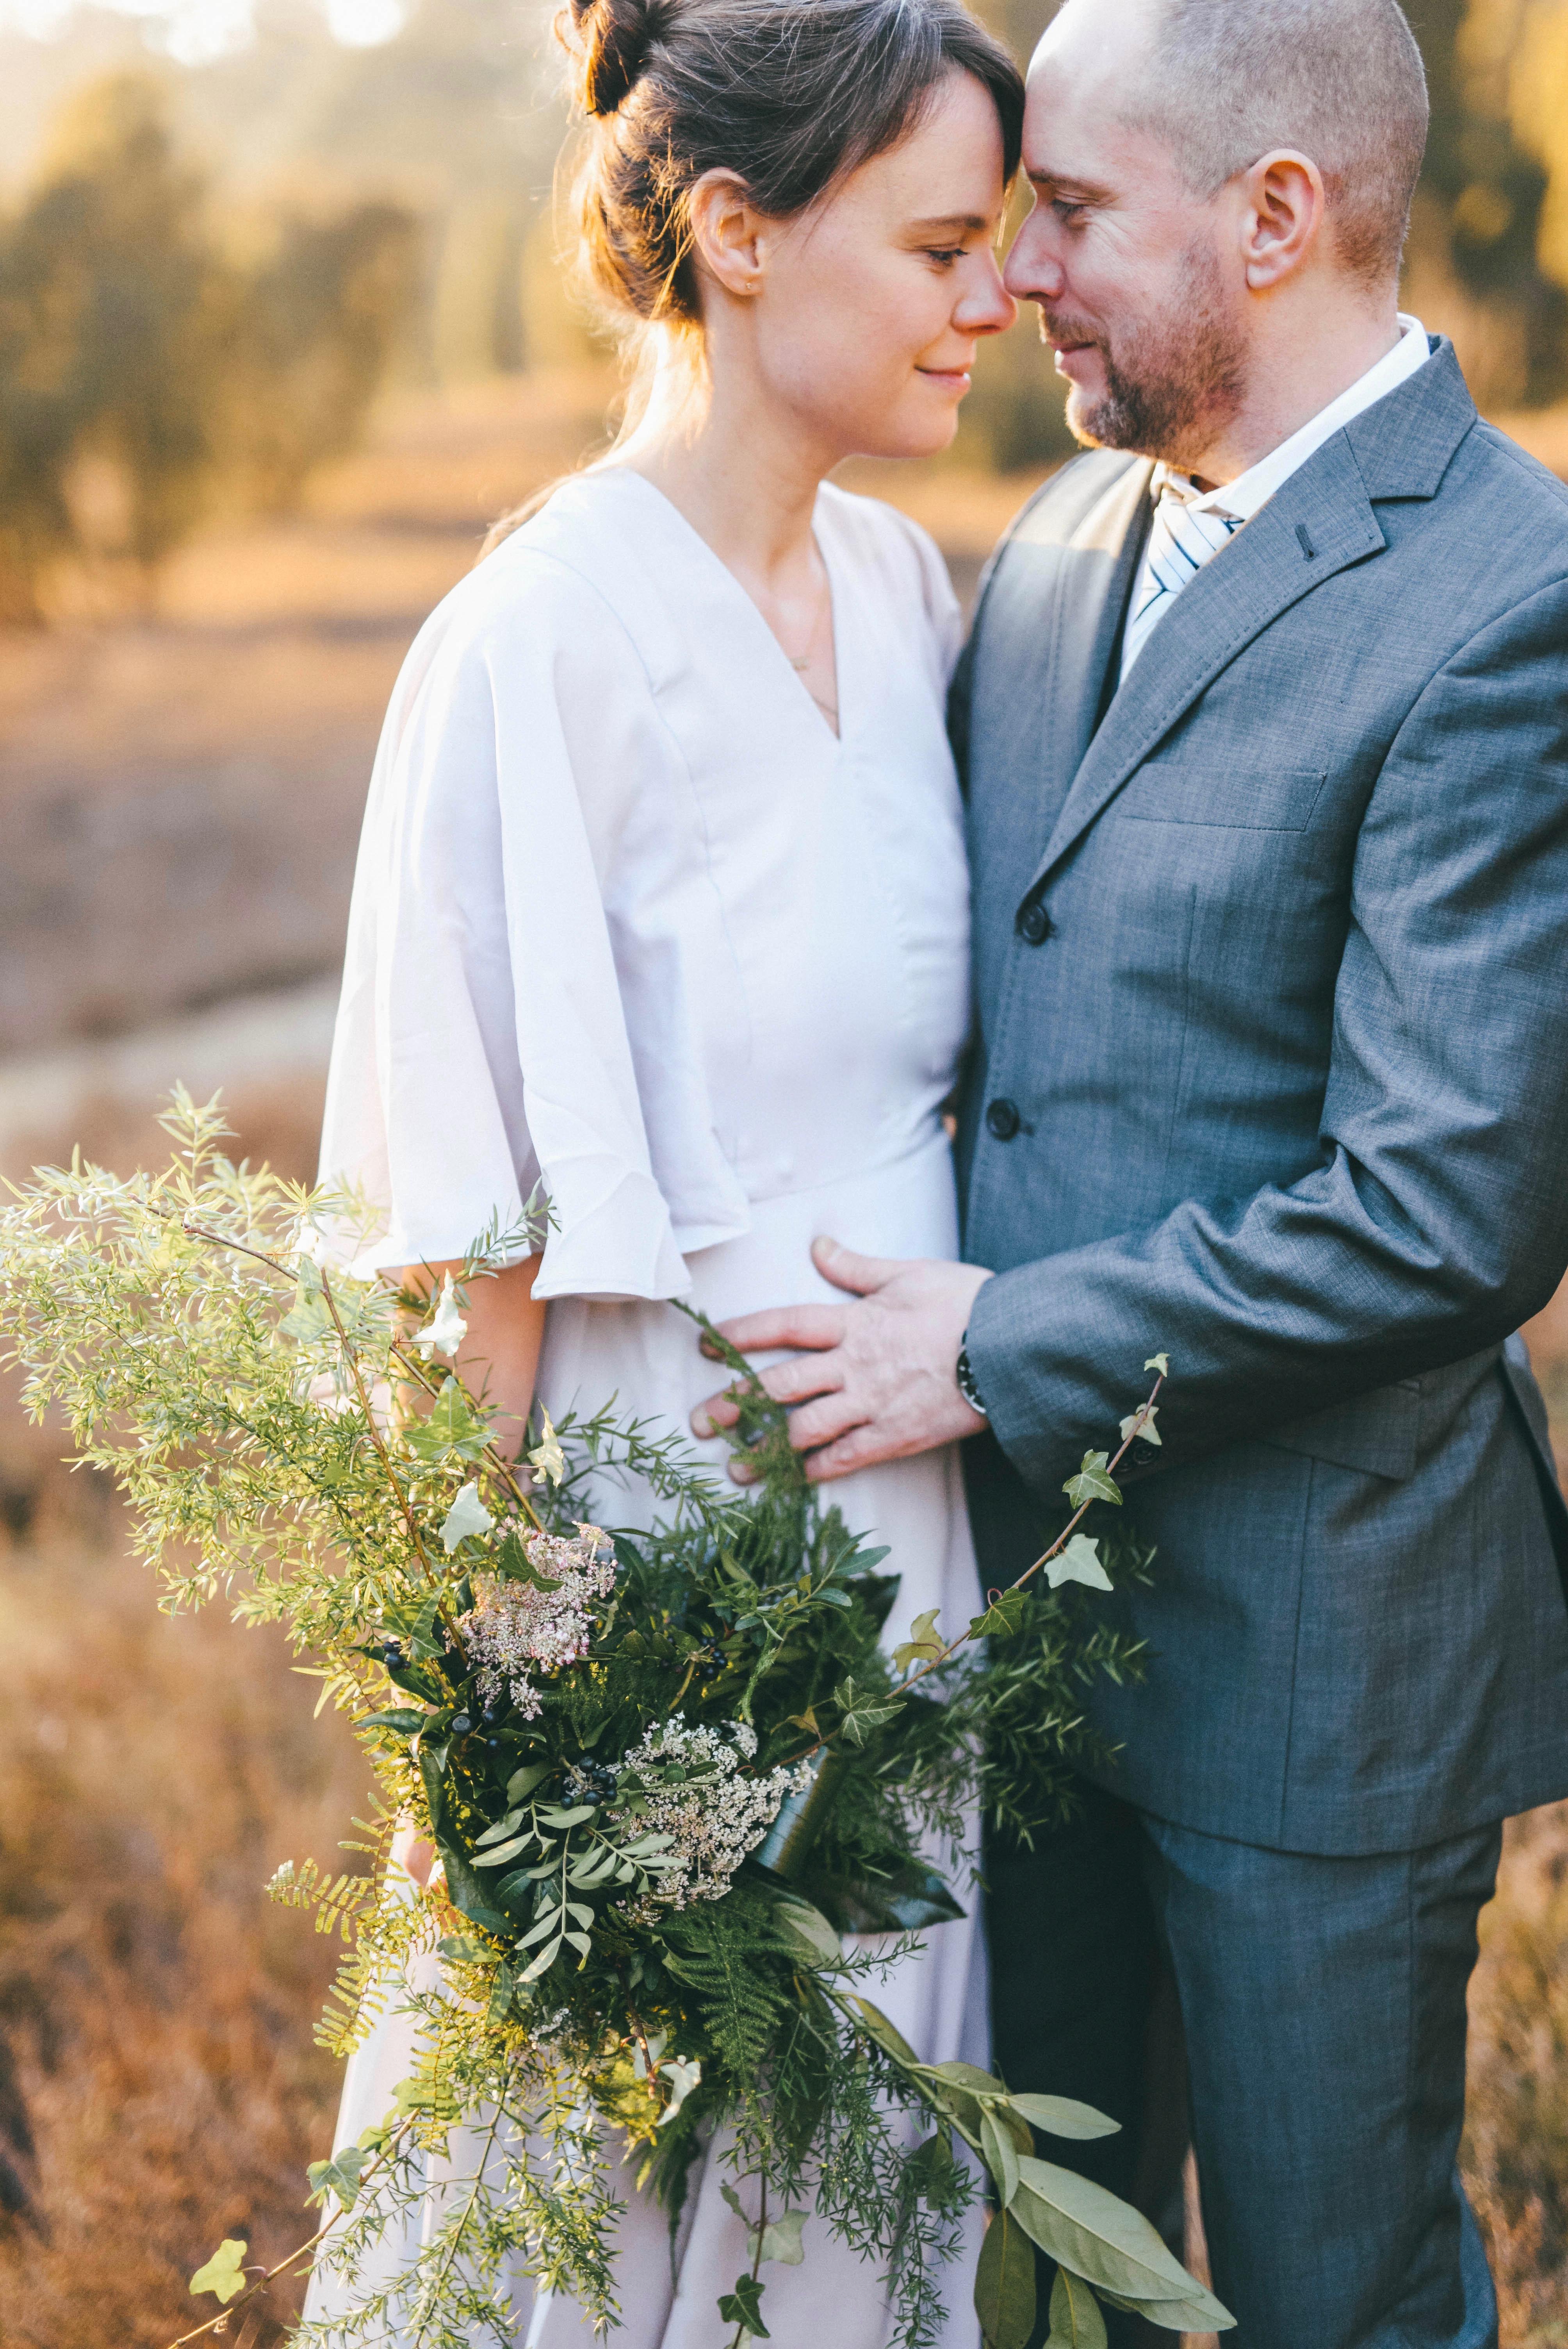 Braut und Bräutigam Brautstrauß Grün